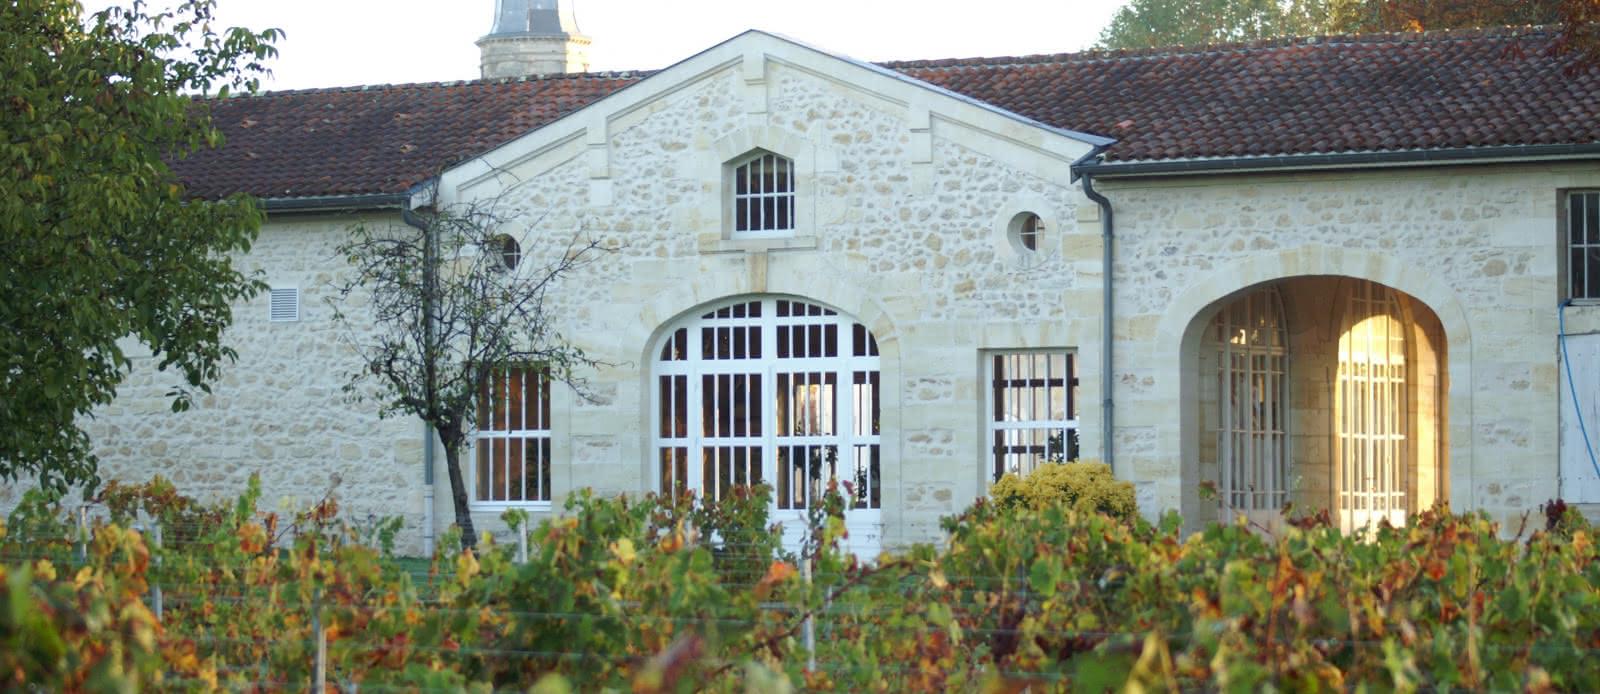 Chateau-Arnauld